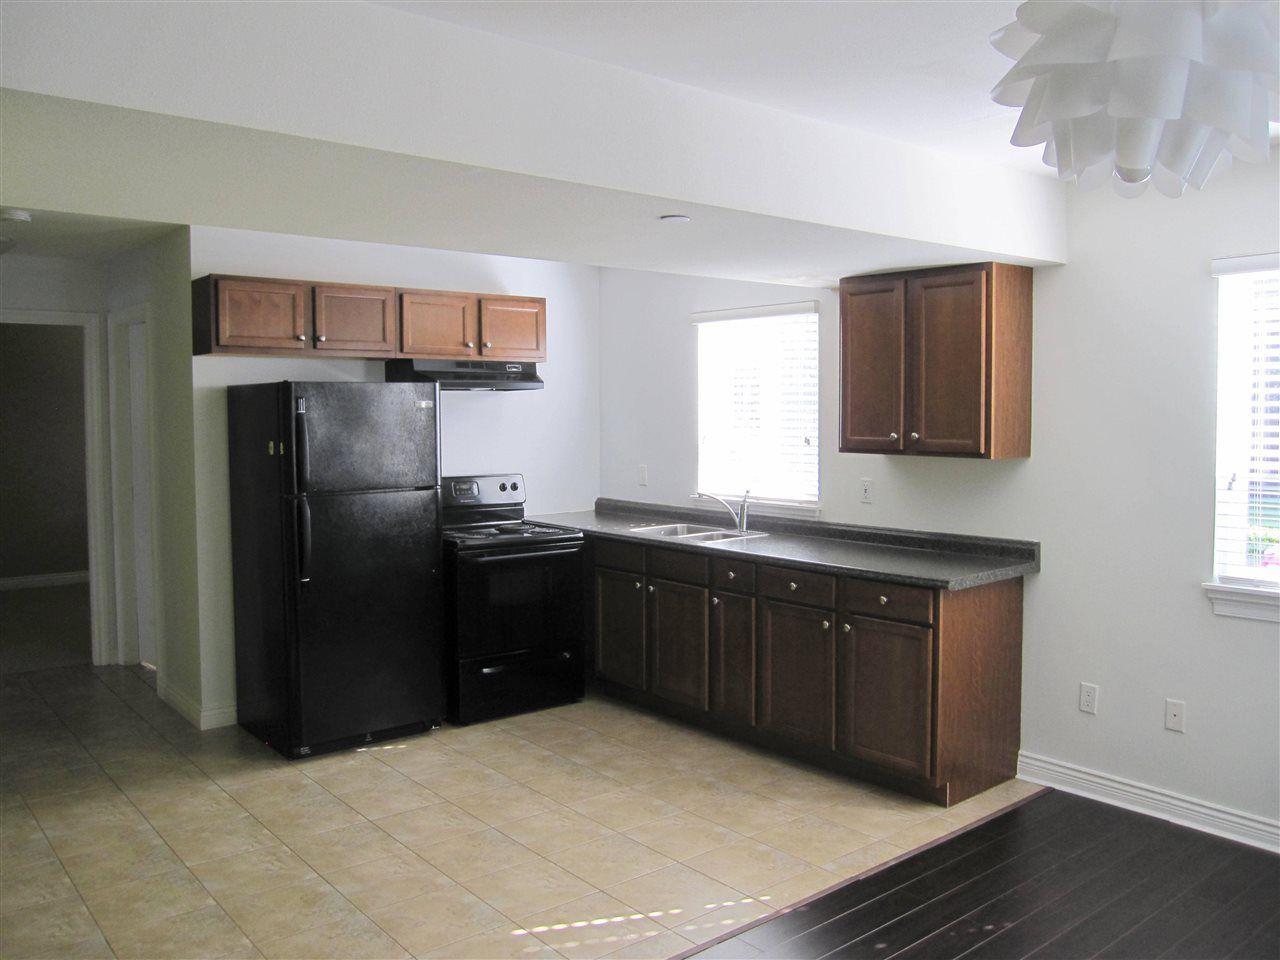 Photo 10: Photos: 11316 236 Street in Maple Ridge: Cottonwood MR House for sale : MLS®# R2062616